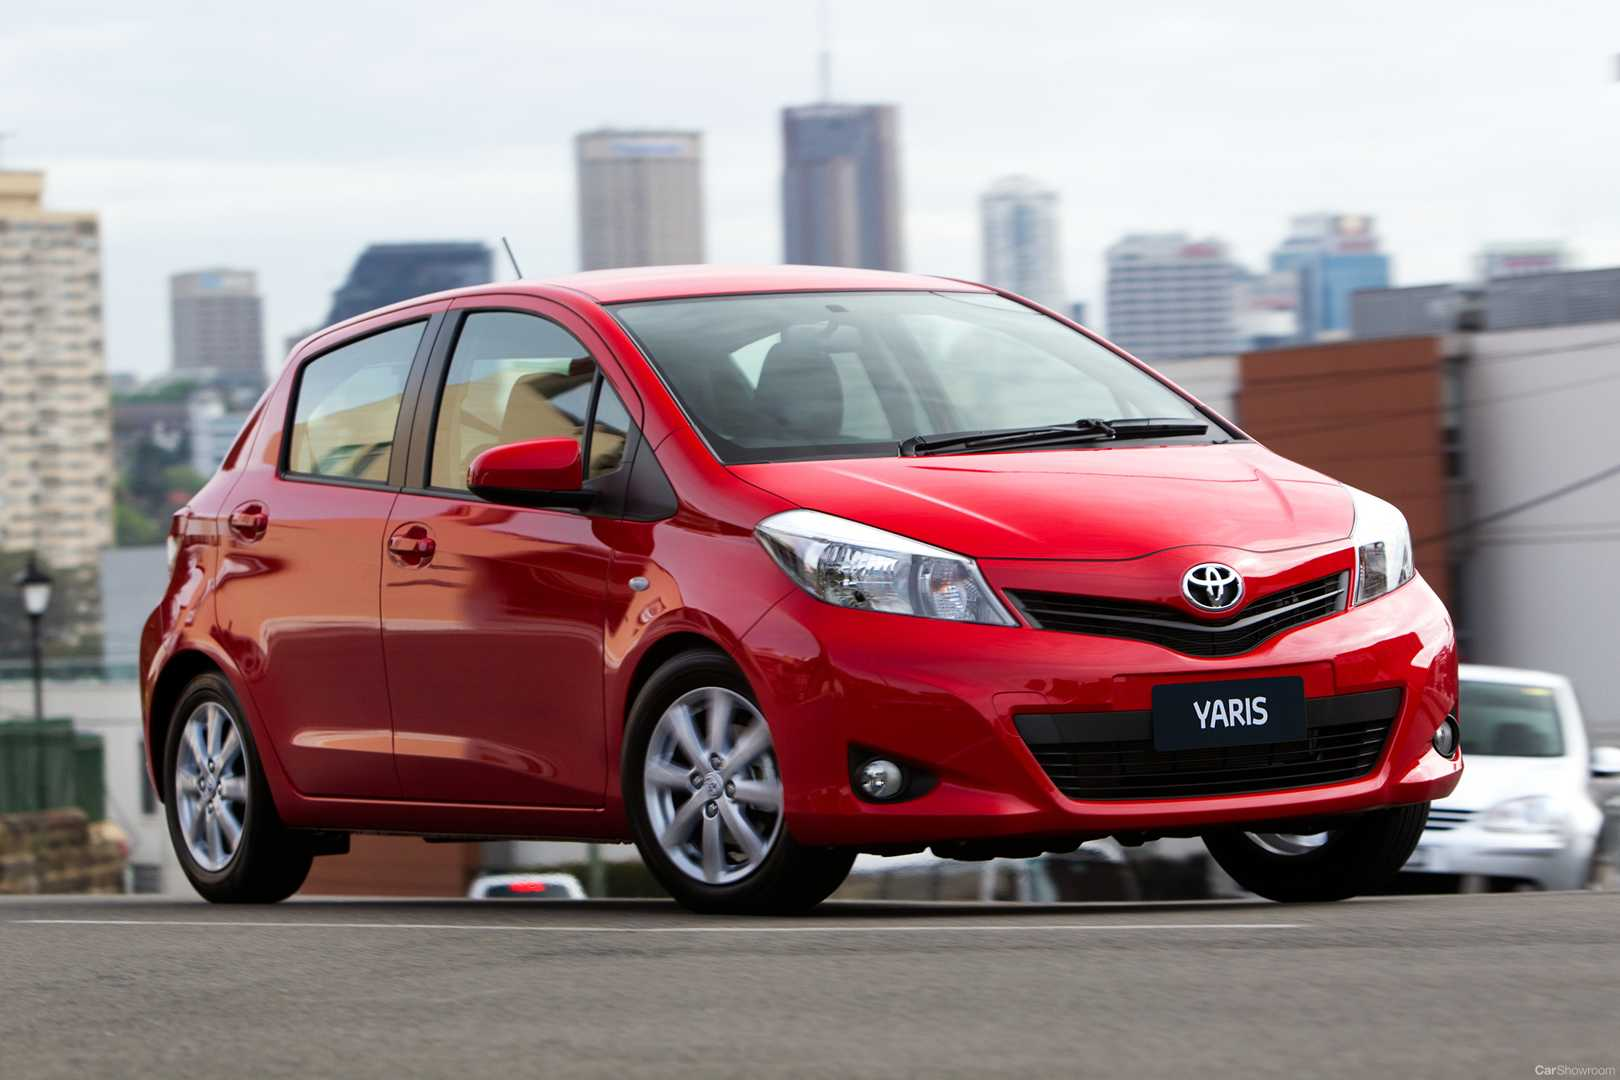 Kekurangan Toyota Yaris 2011 Tangguh